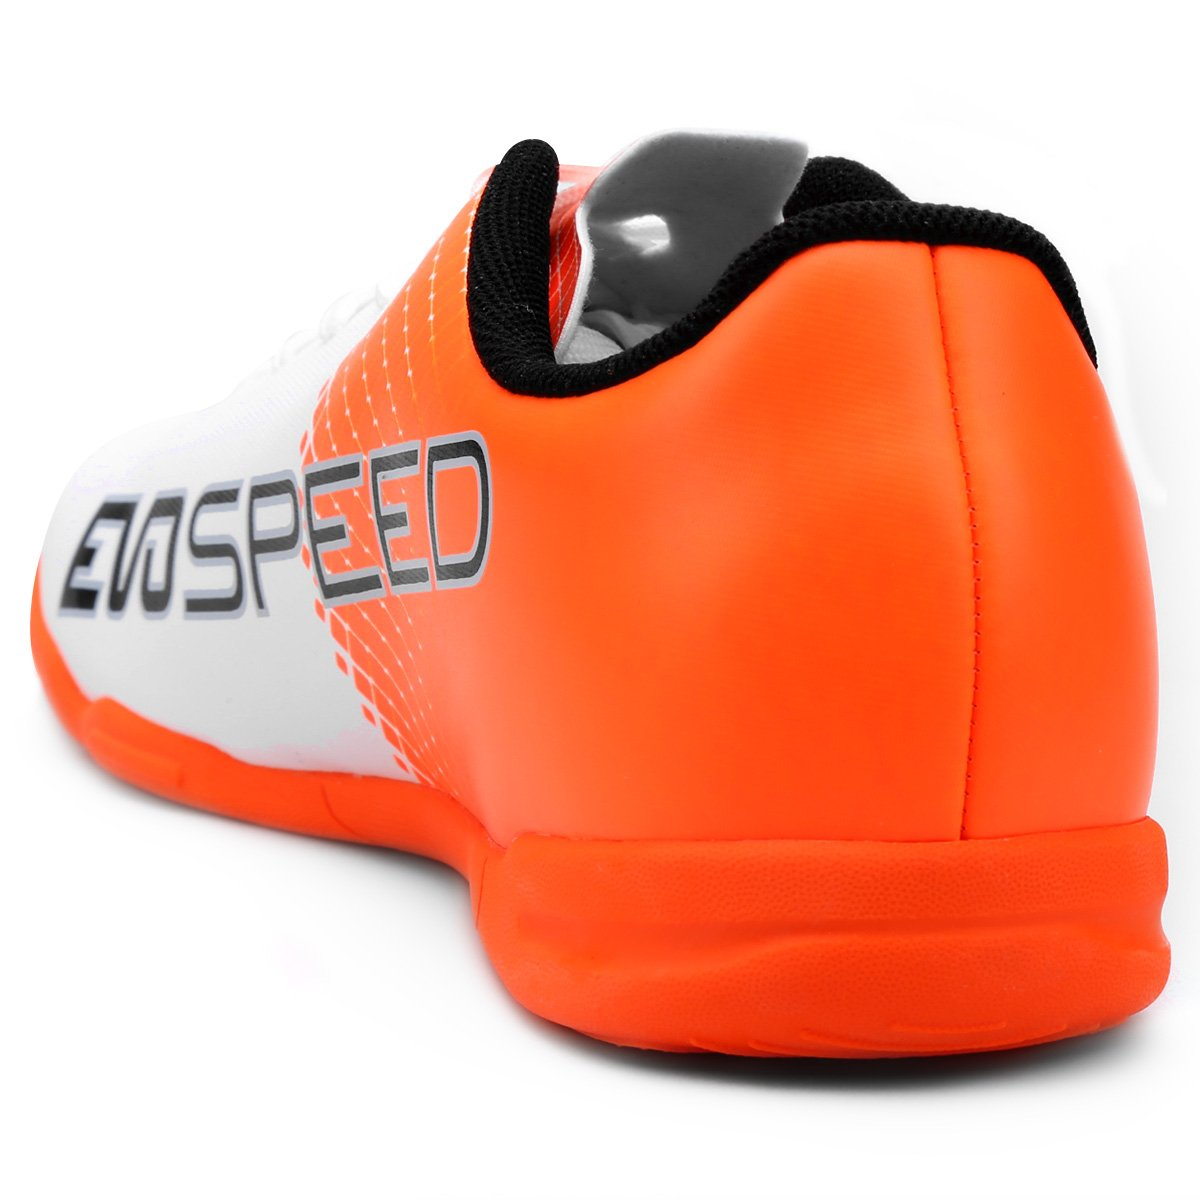 Chuteira Futsal Puma Evospeed 5.5 Tricks IT - Compre Agora  cfbaf02ff98ed